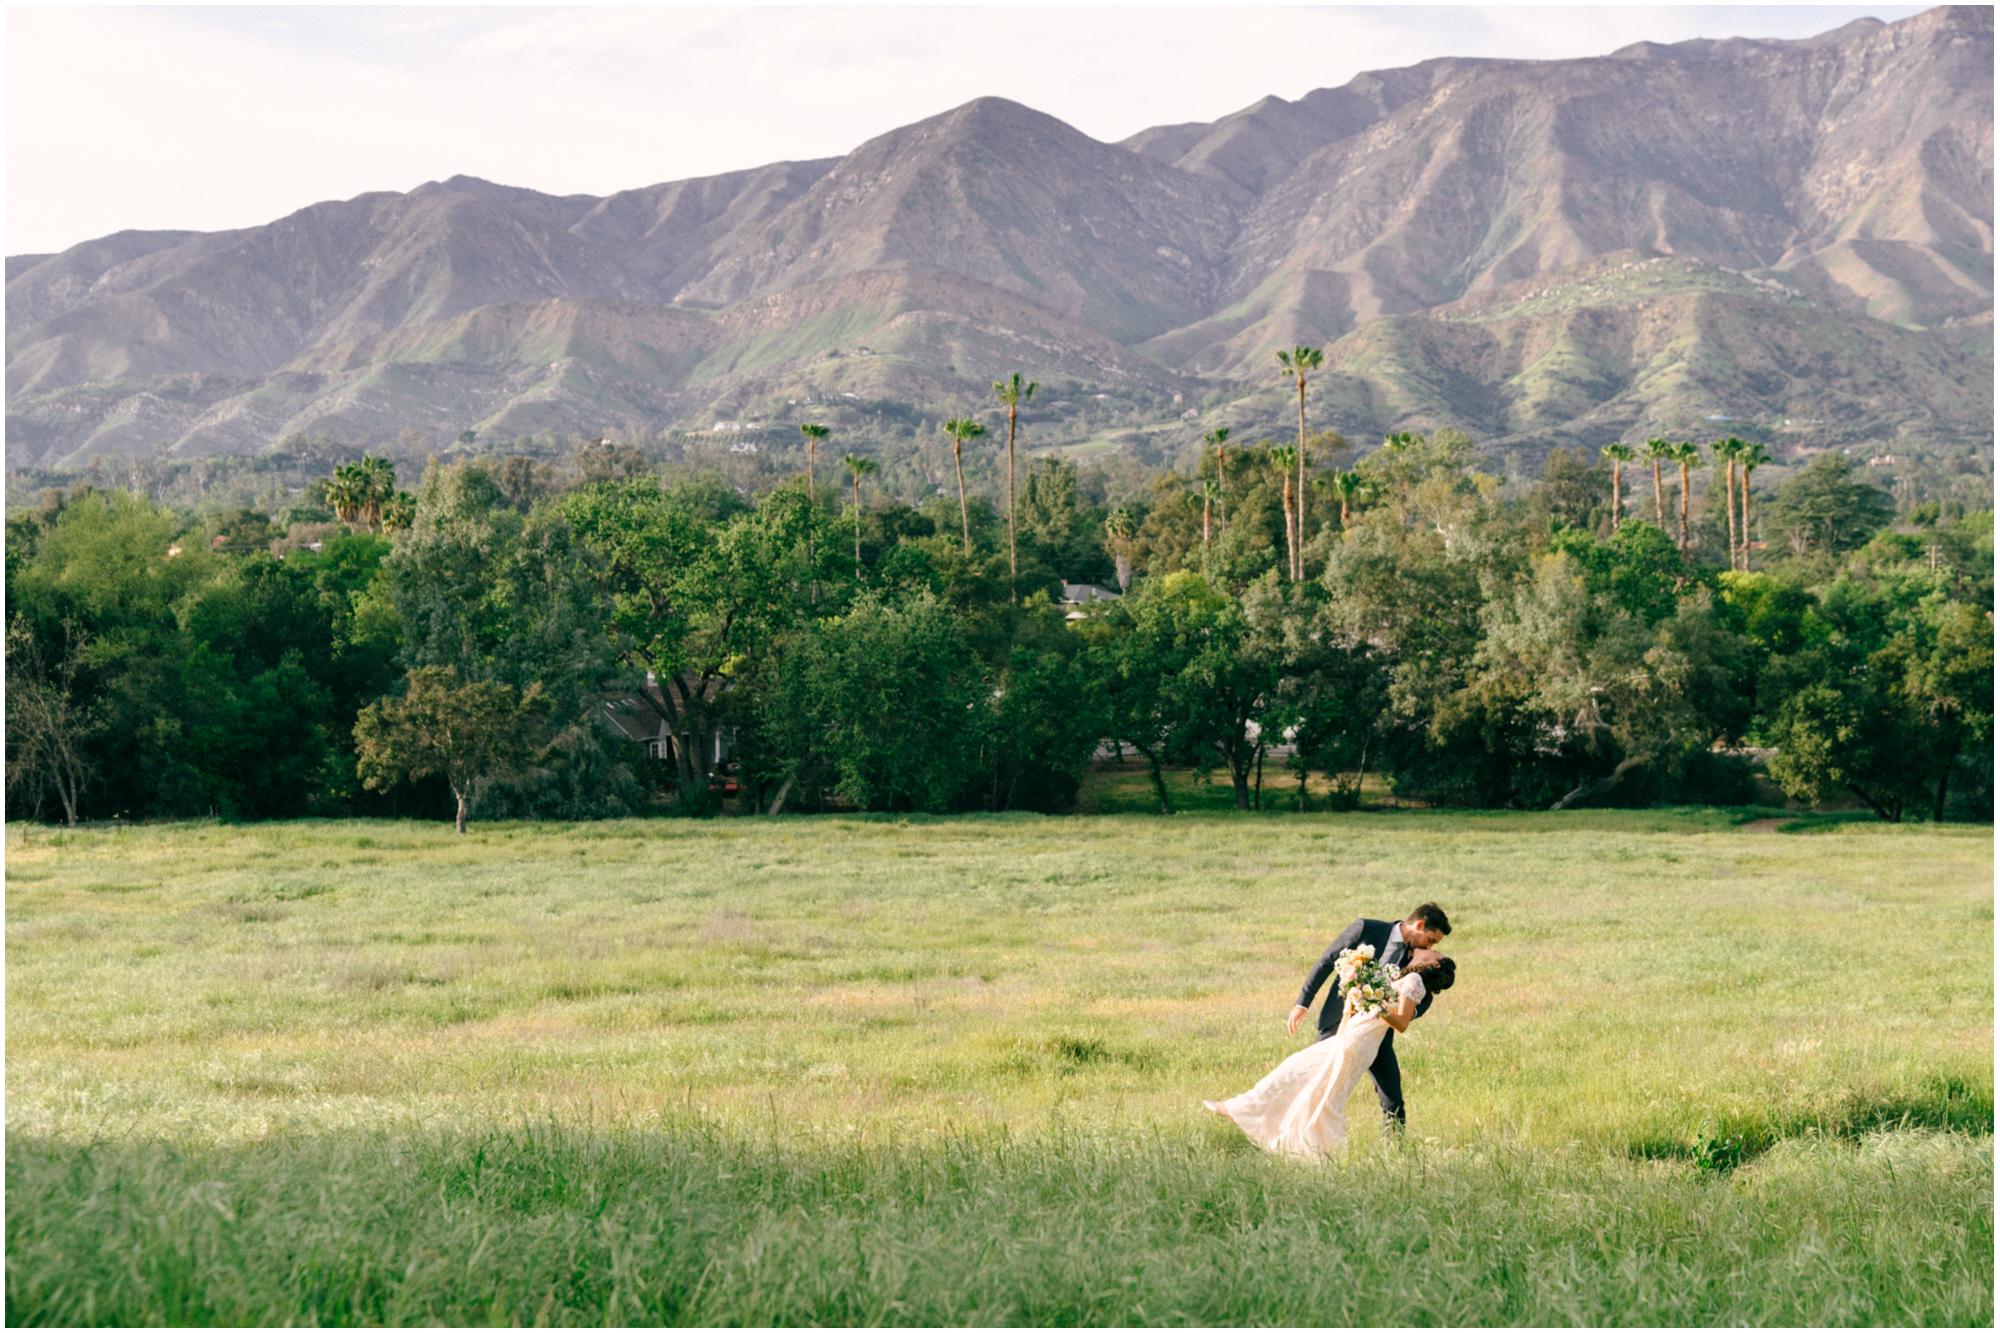 Los_Angeles_Wedding_Photographer_Ojai_Wedding_Pinnel_Photography-14.jpg